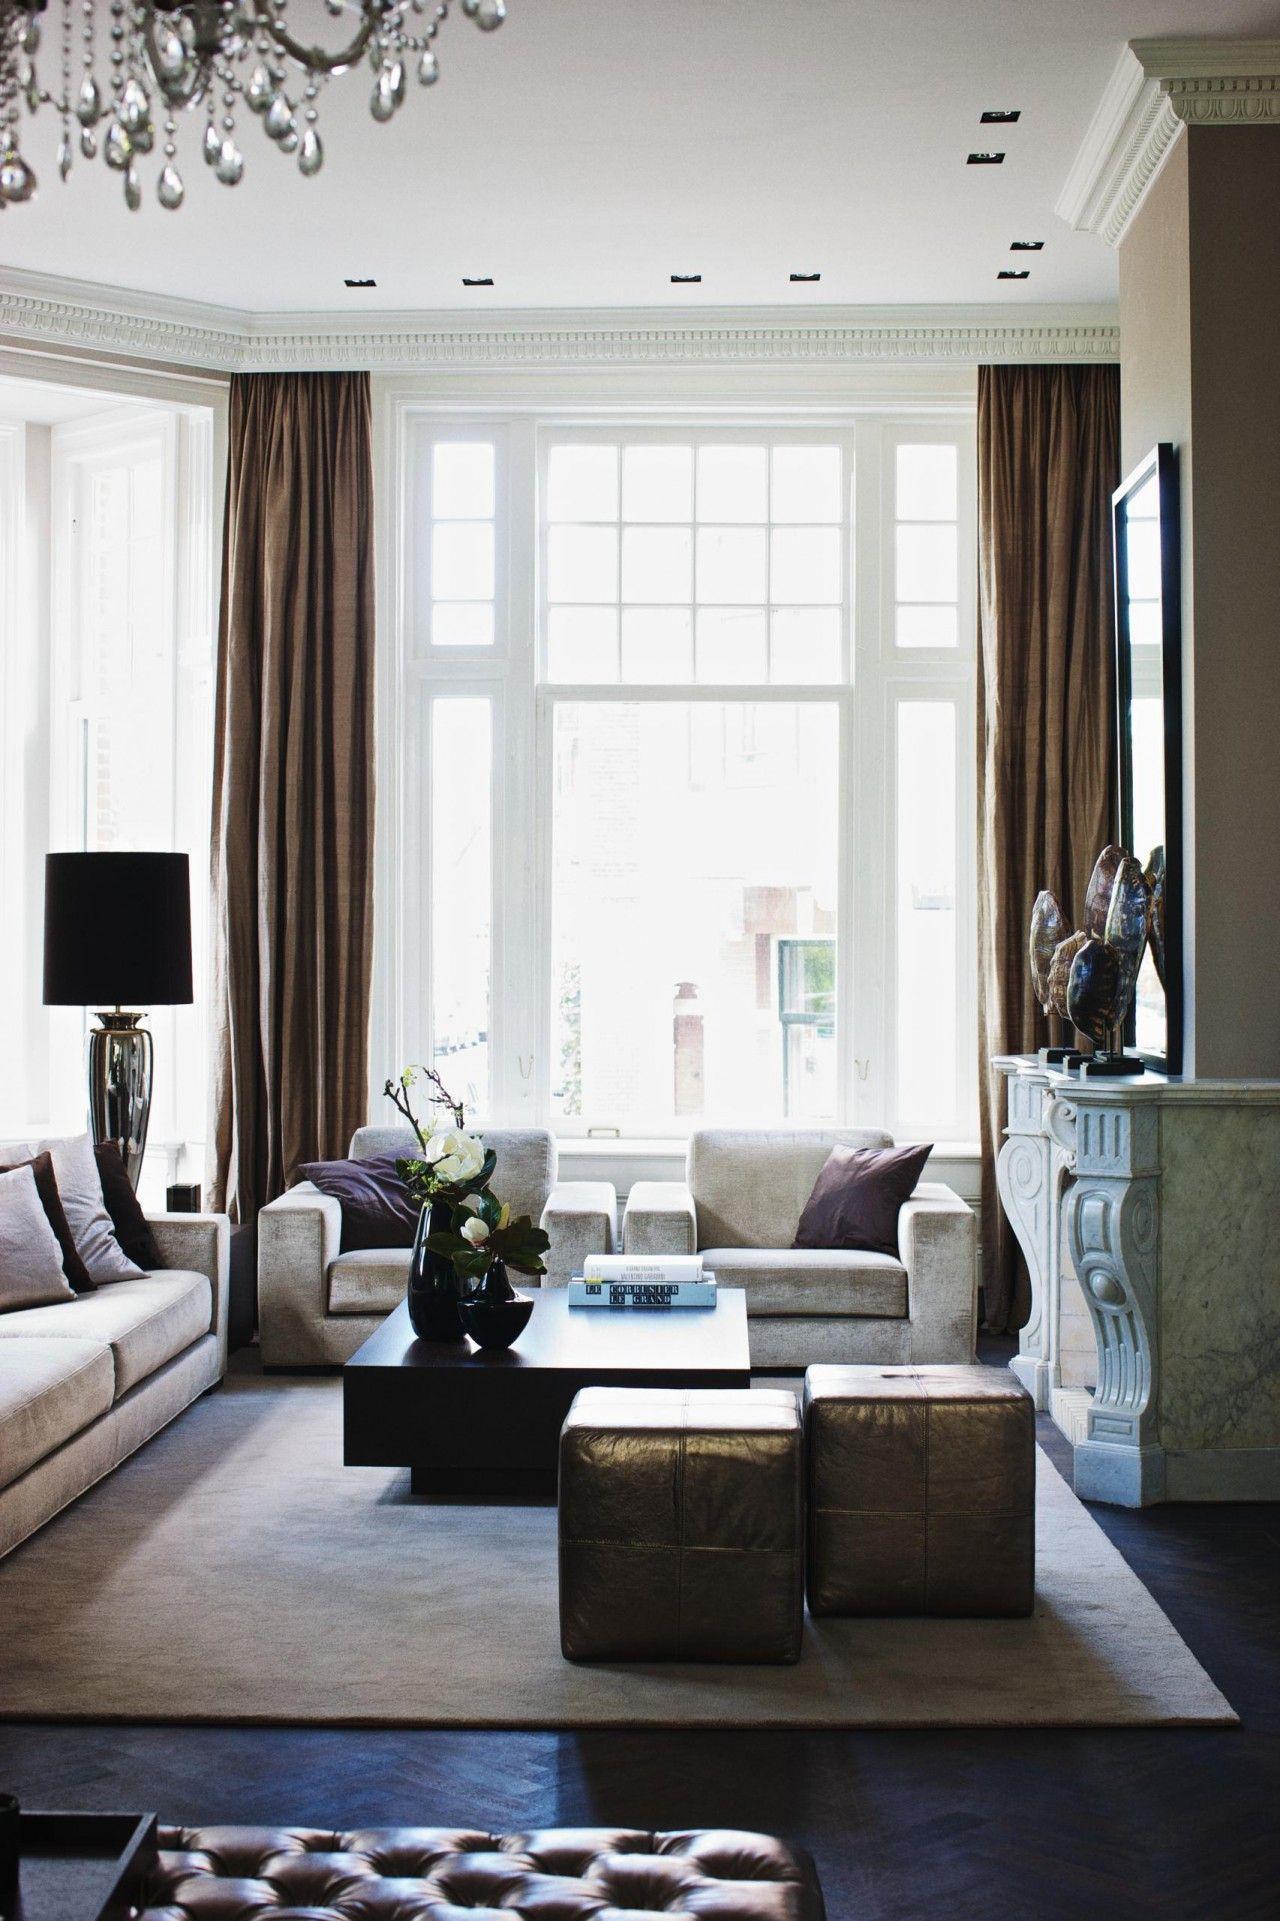 The netherlands amsterdam private residence living room eric kuster metropolitan luxury